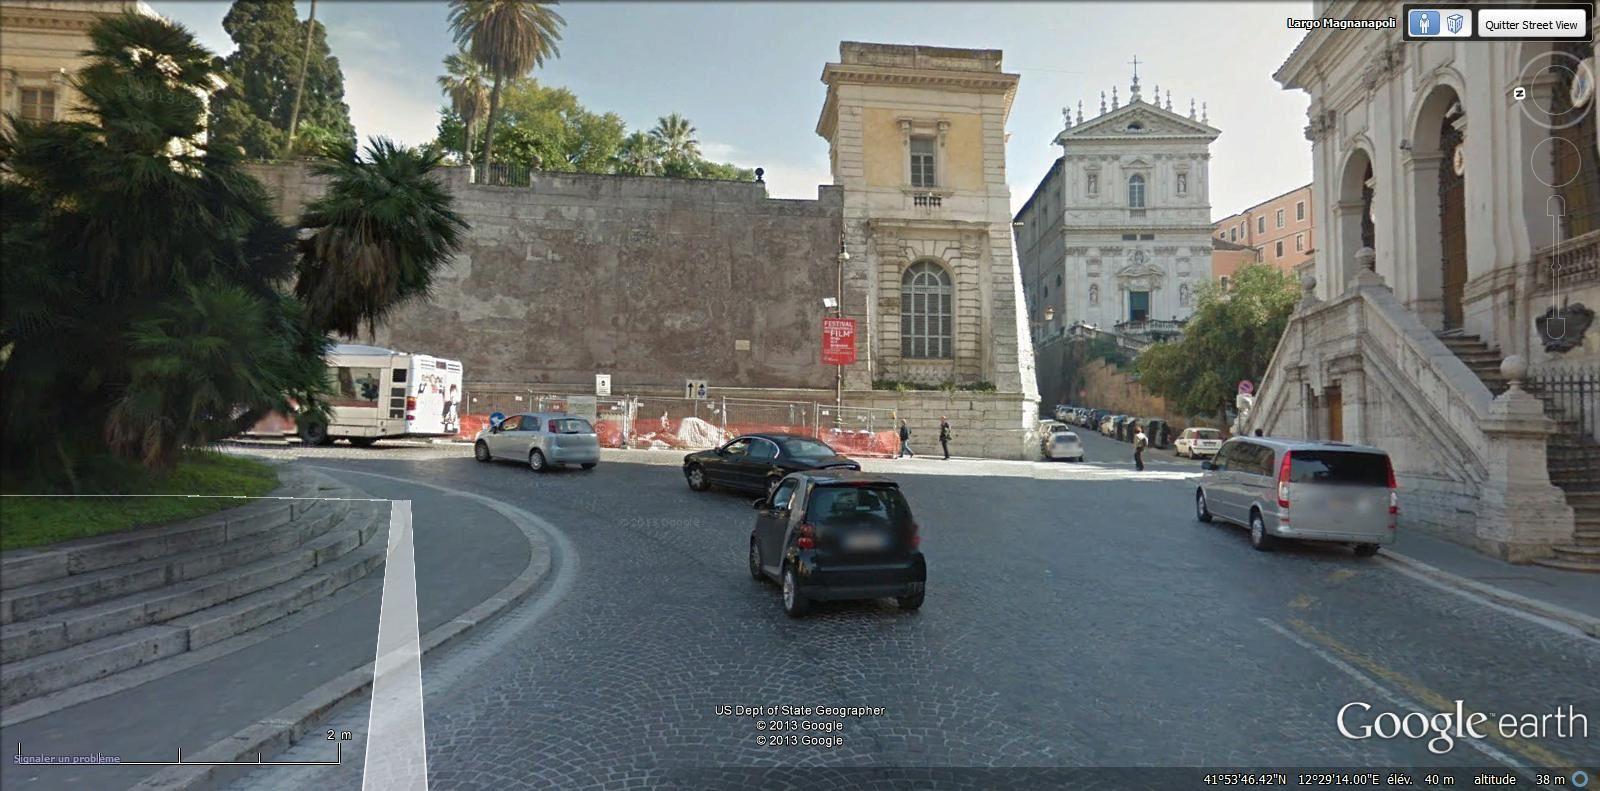 largo Magnanapoli ( Monti métro Colosseo ou Cavour)